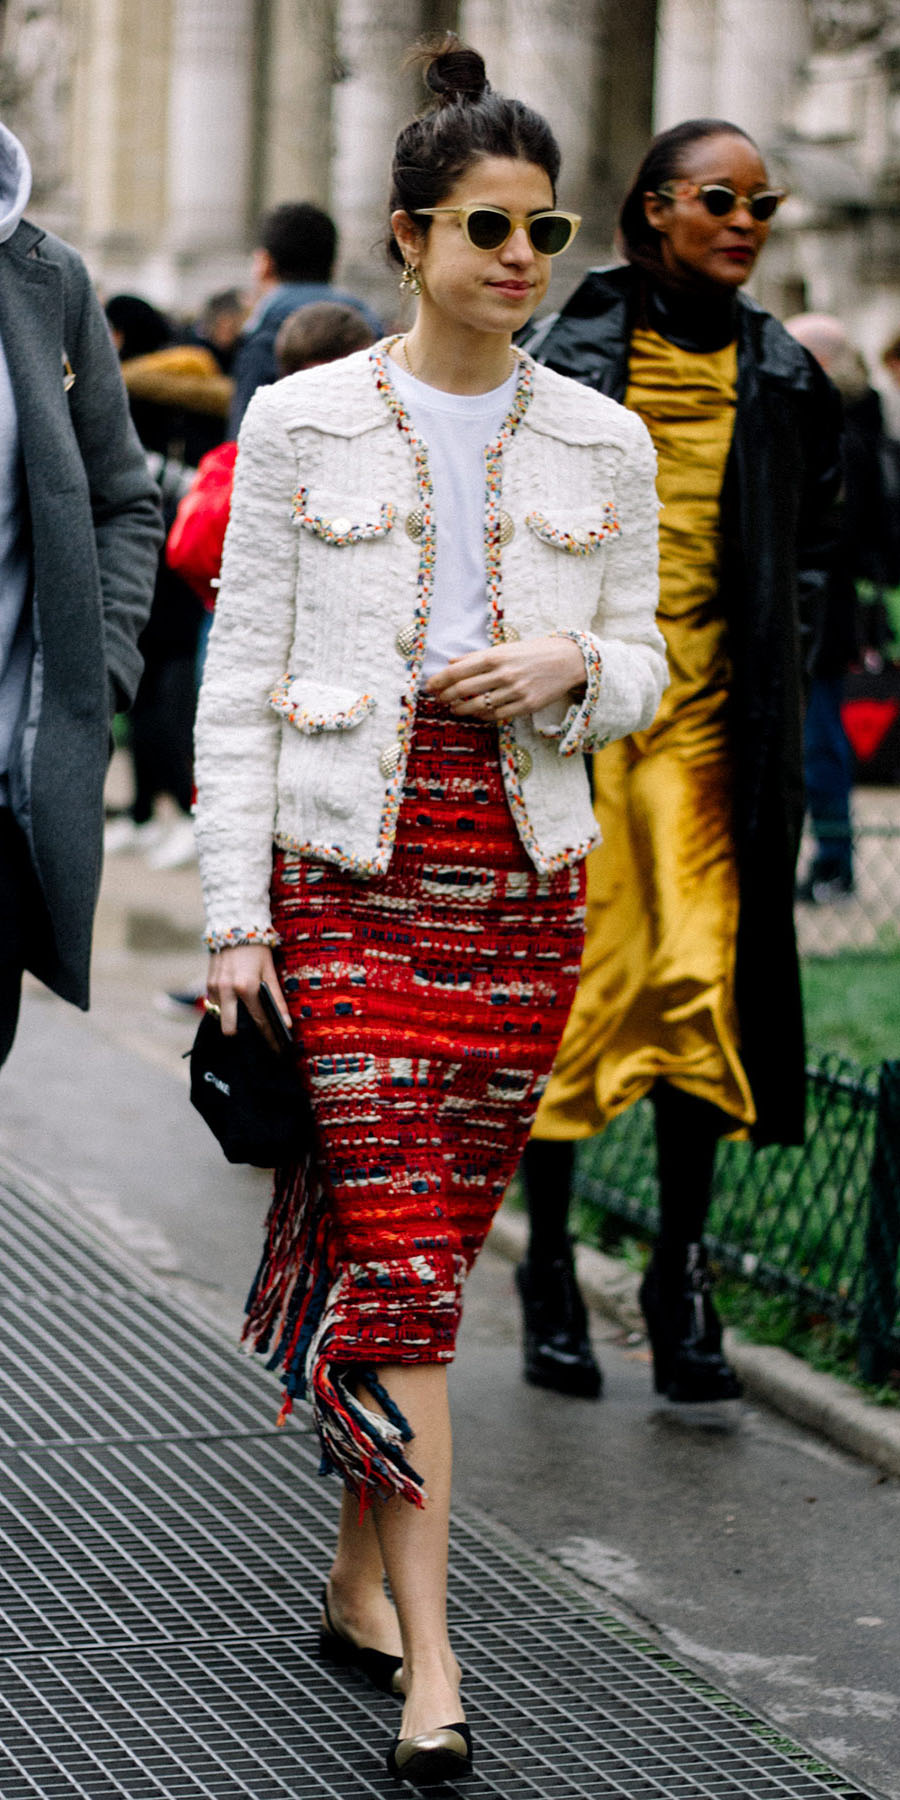 red-midi-skirt-tweed-white-tee-brun-bun-sun-black-shoe-flats-white-jacket-lady-fall-winter-lunch.jpg